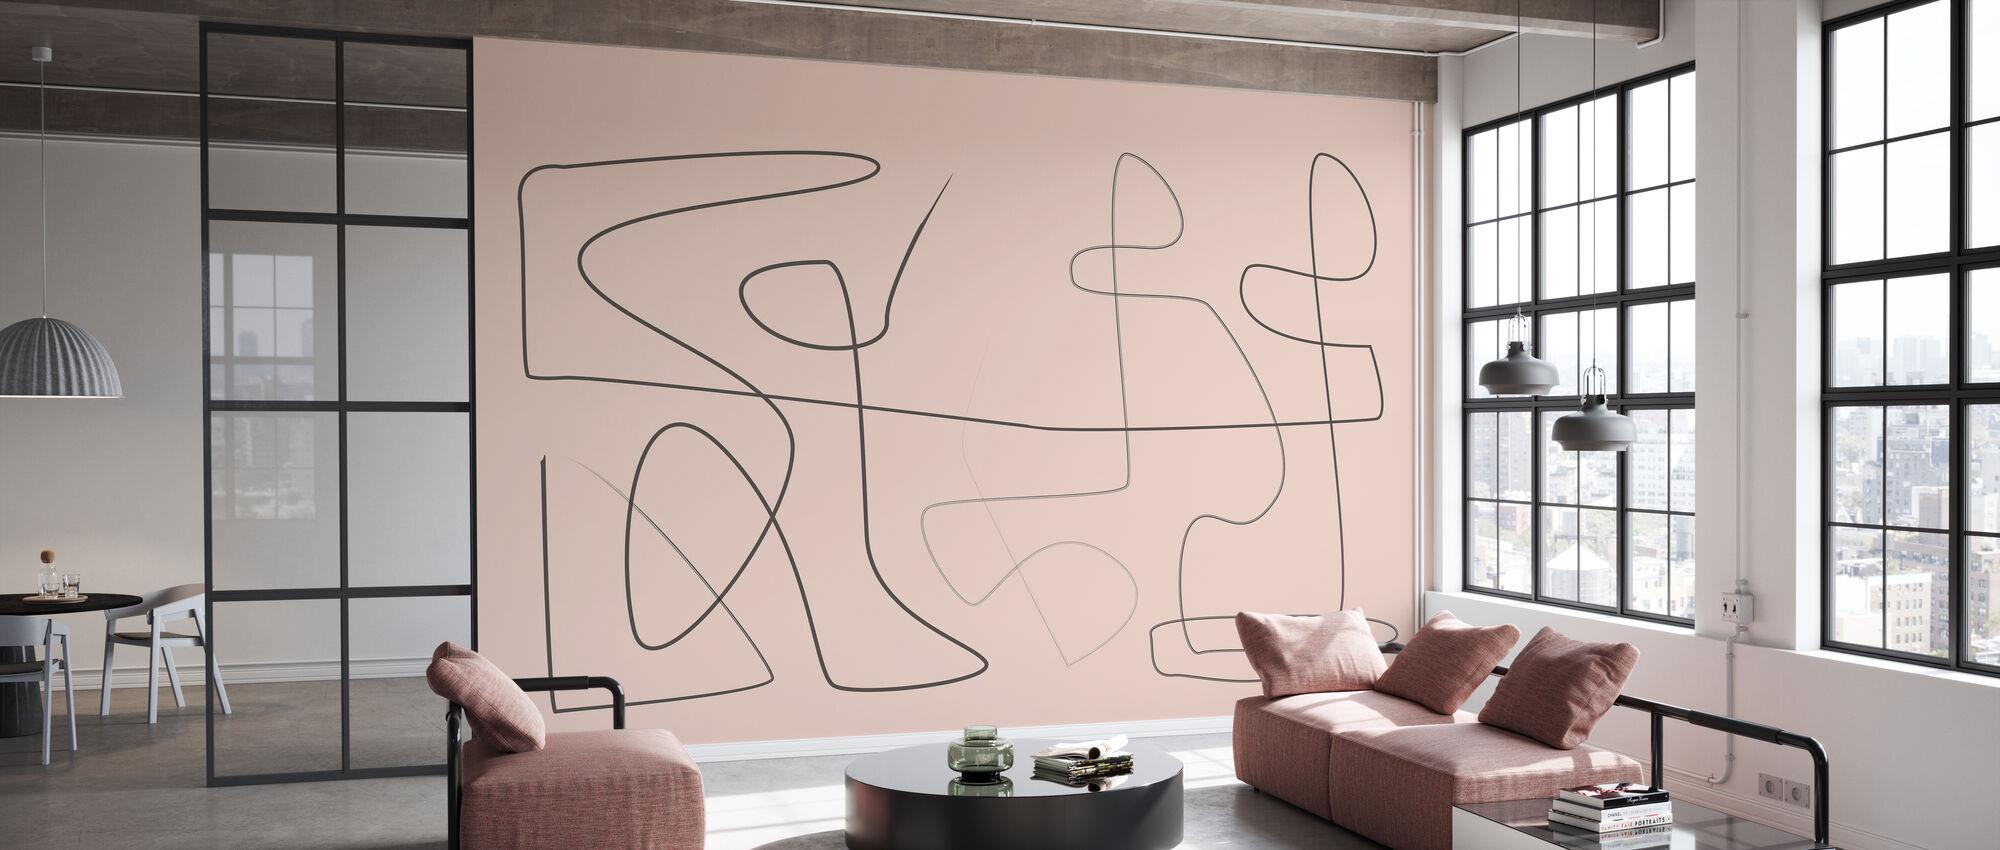 Gently - Wallpaper - Office